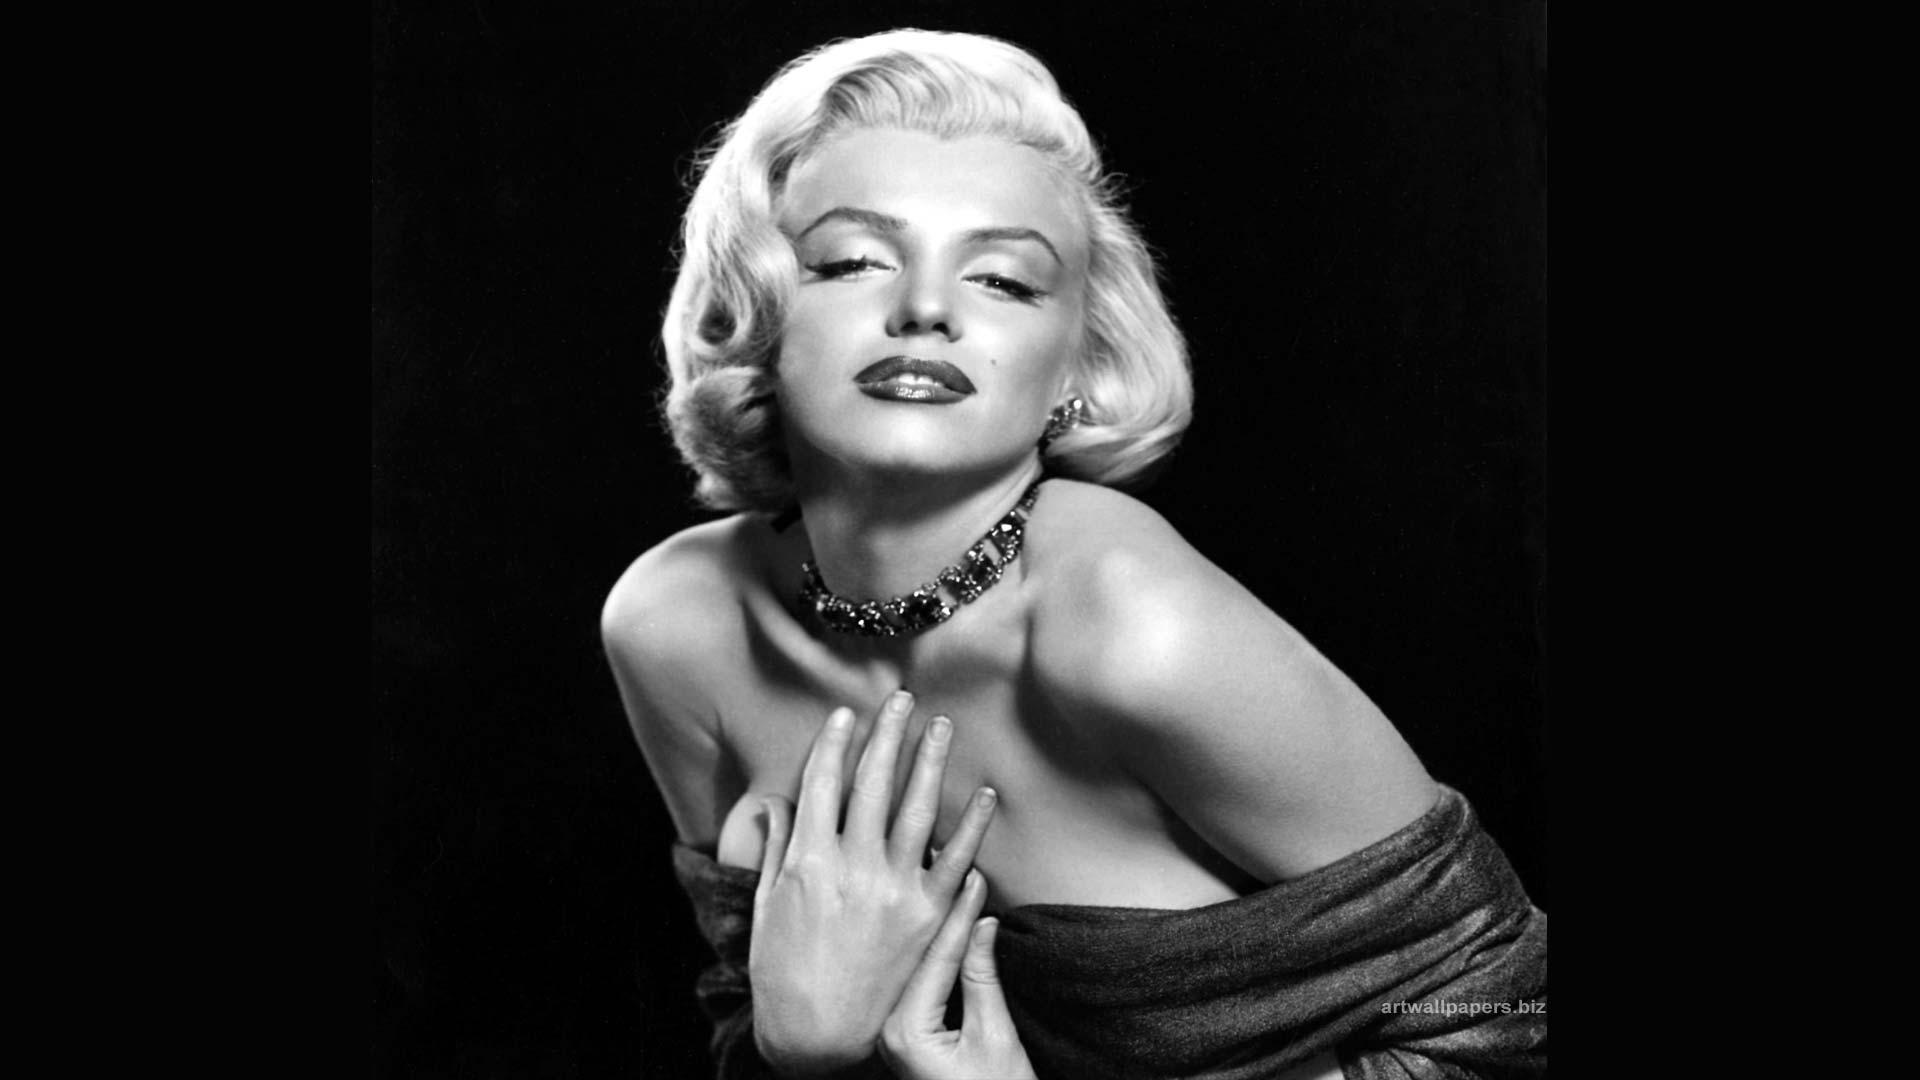 Citaten Marilyn Monroe Hd : Hd marilyn monroe wallpapers wallpapersafari